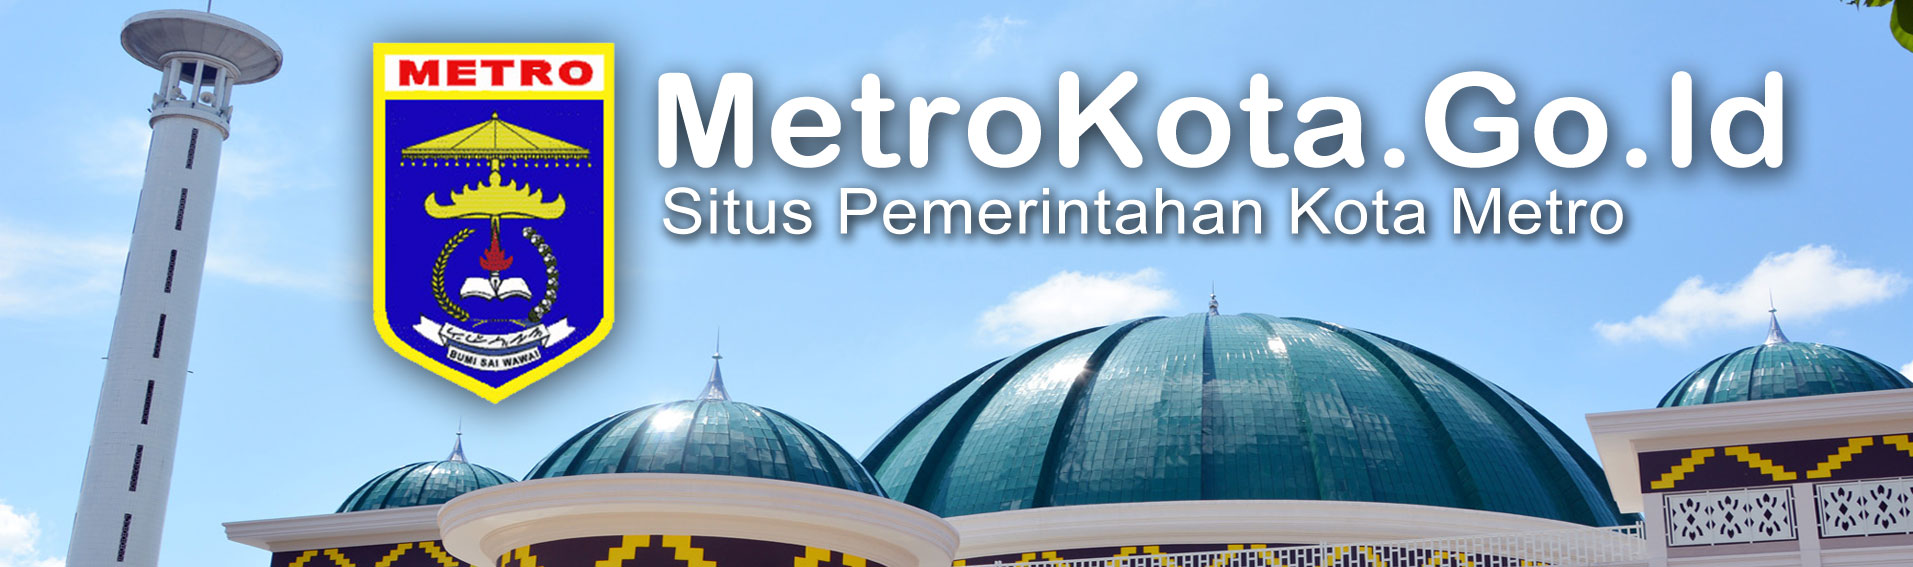 http://www.metrokota.go.id/